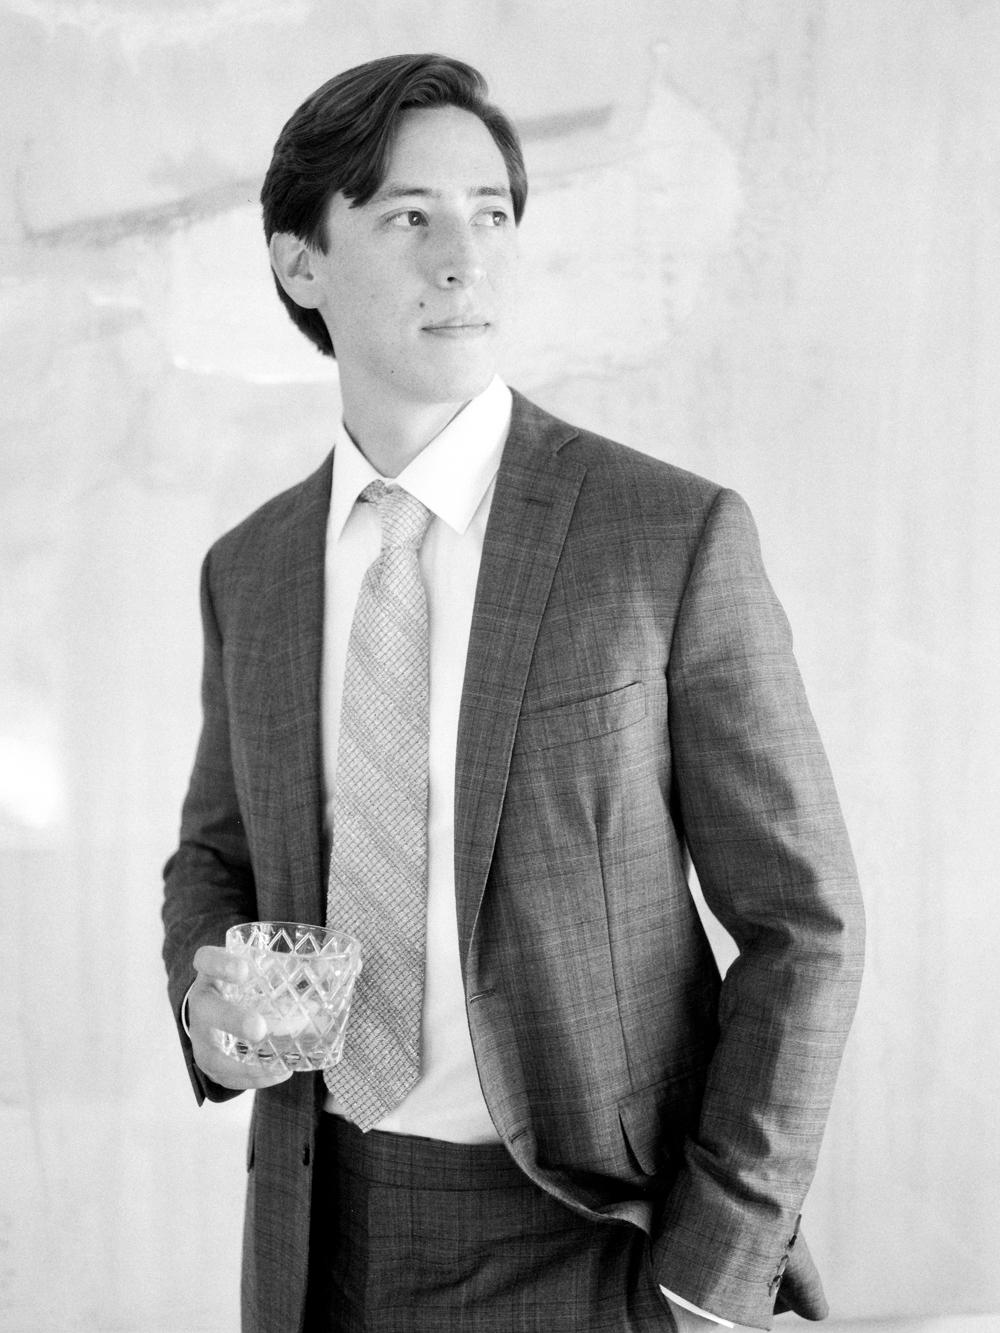 Christine Gosch - destination film photographer - houston wedding photographer - fine art film photographer - elopement photographer - destination wedding - understated wedding - simple beautiful wedding photography-15.jpg